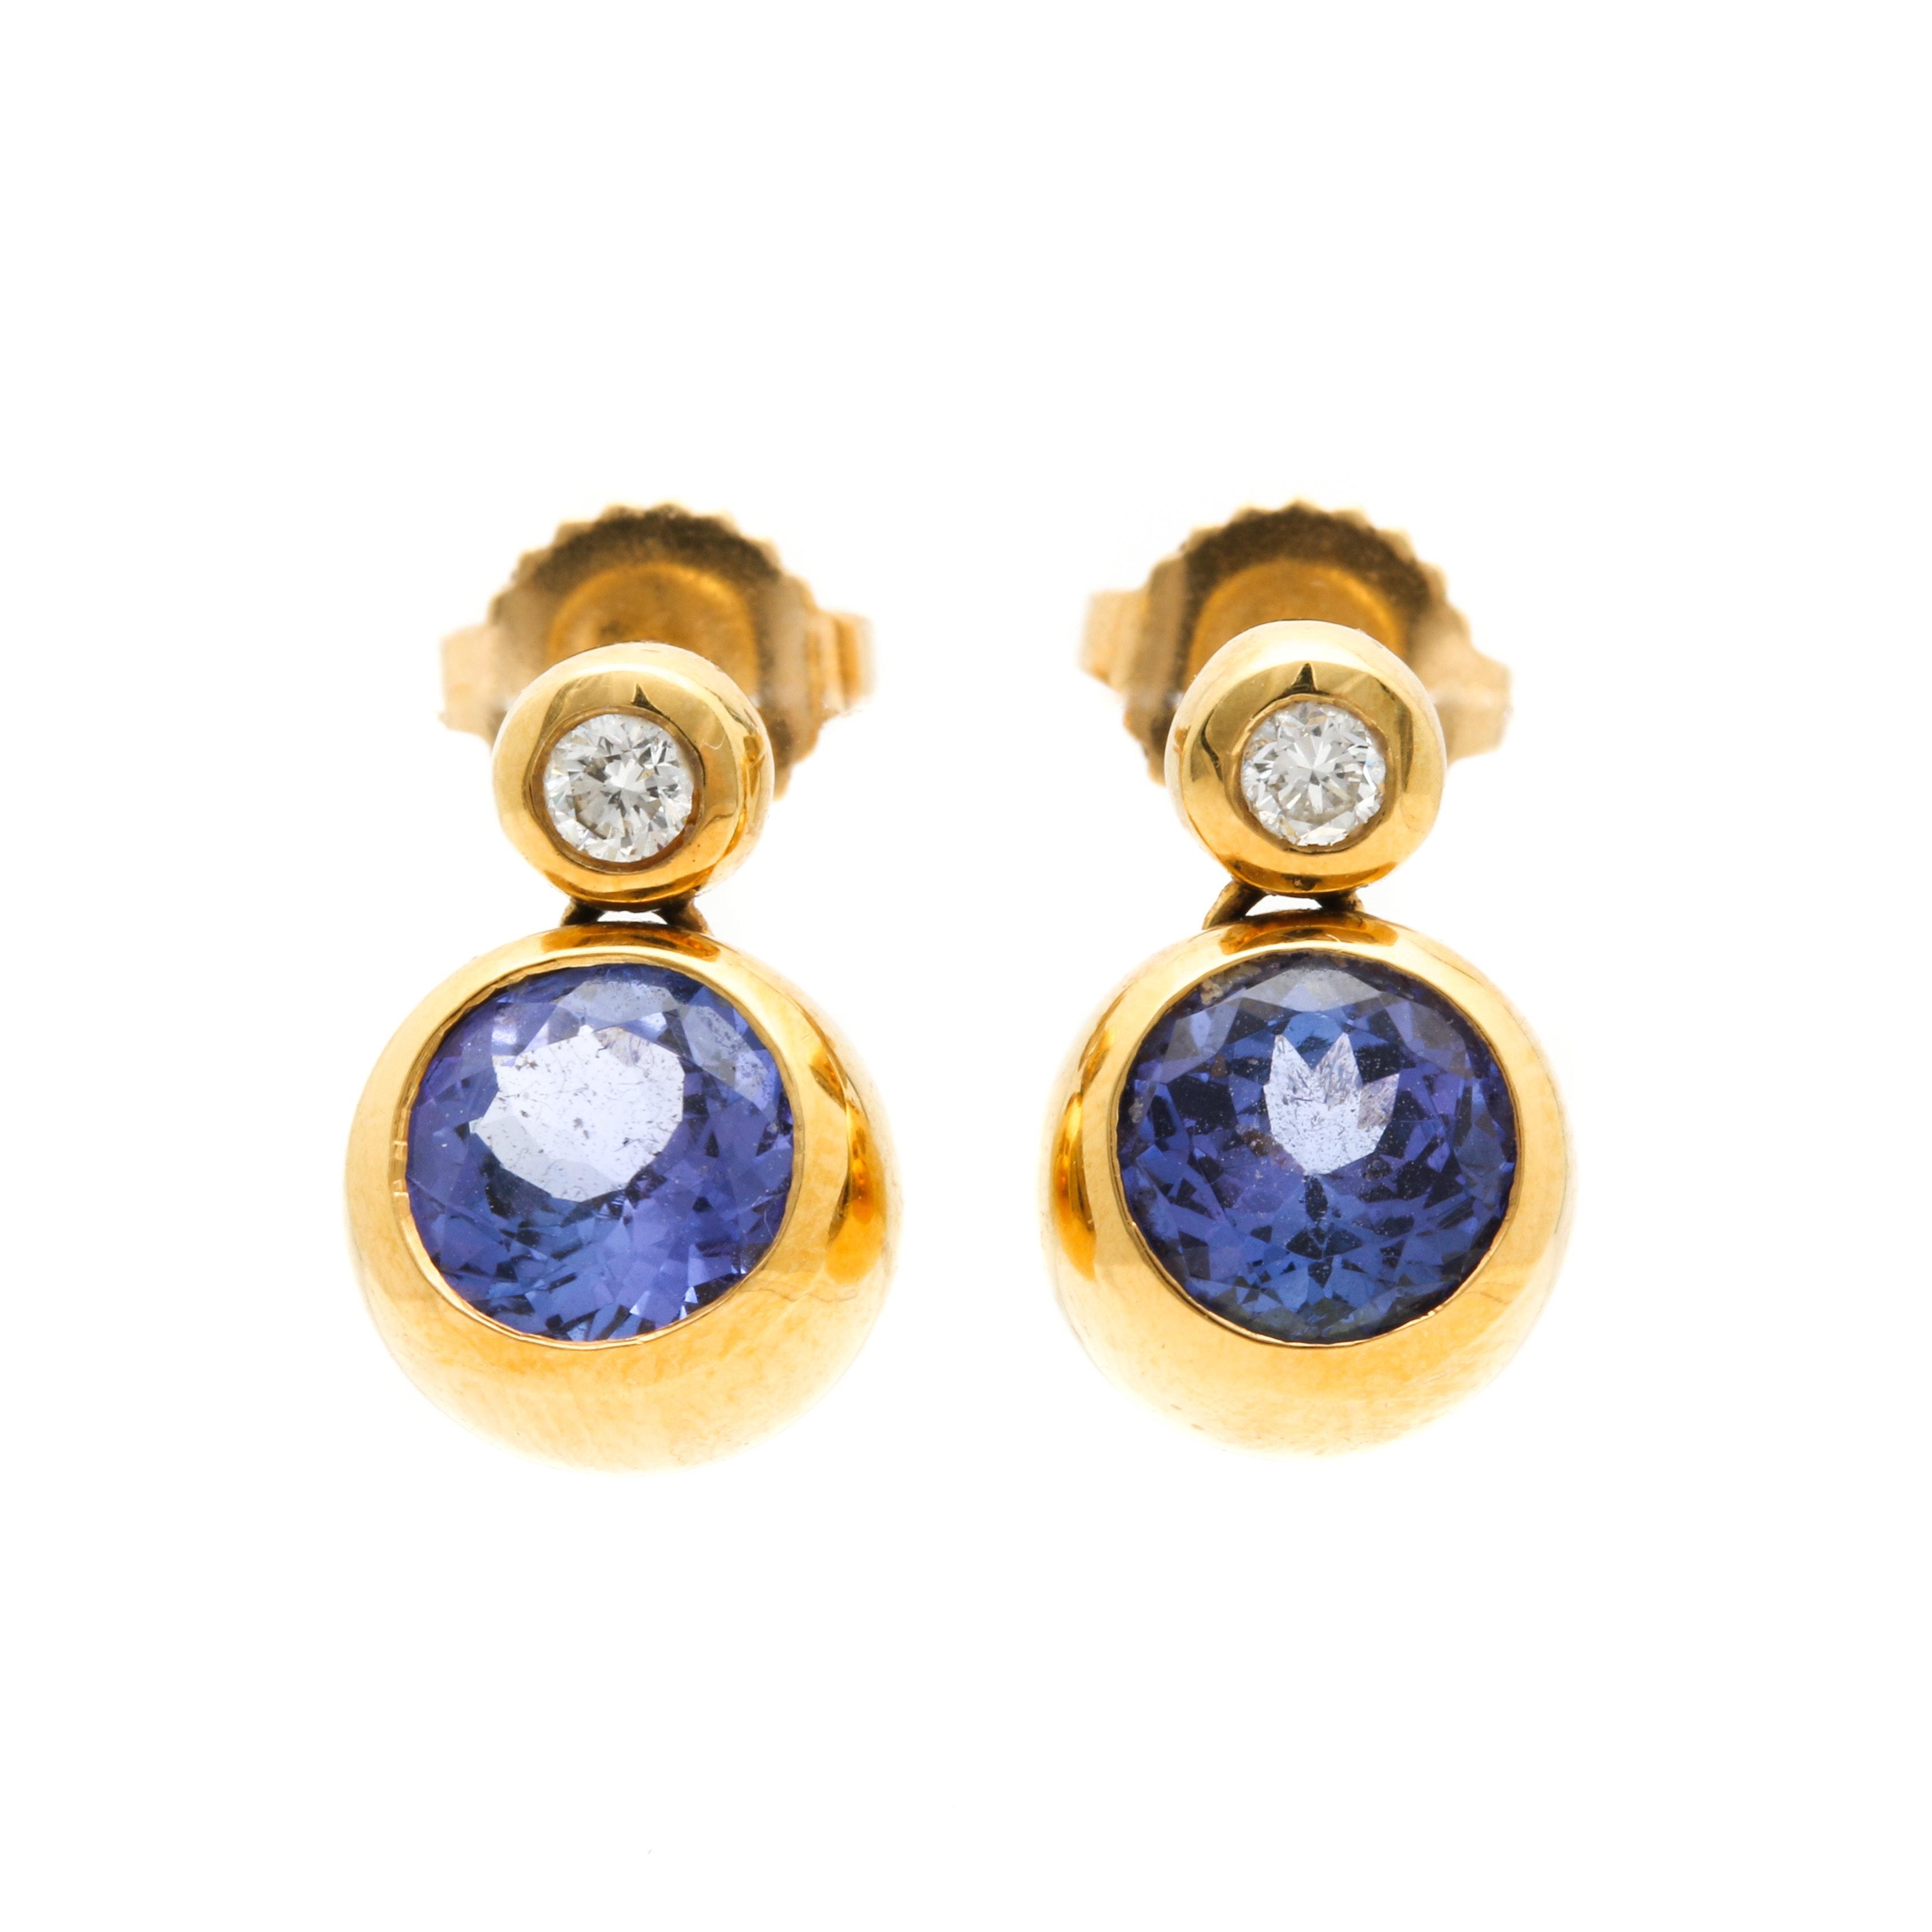 18K Yellow Gold Diamond and Tanzanite Earrings